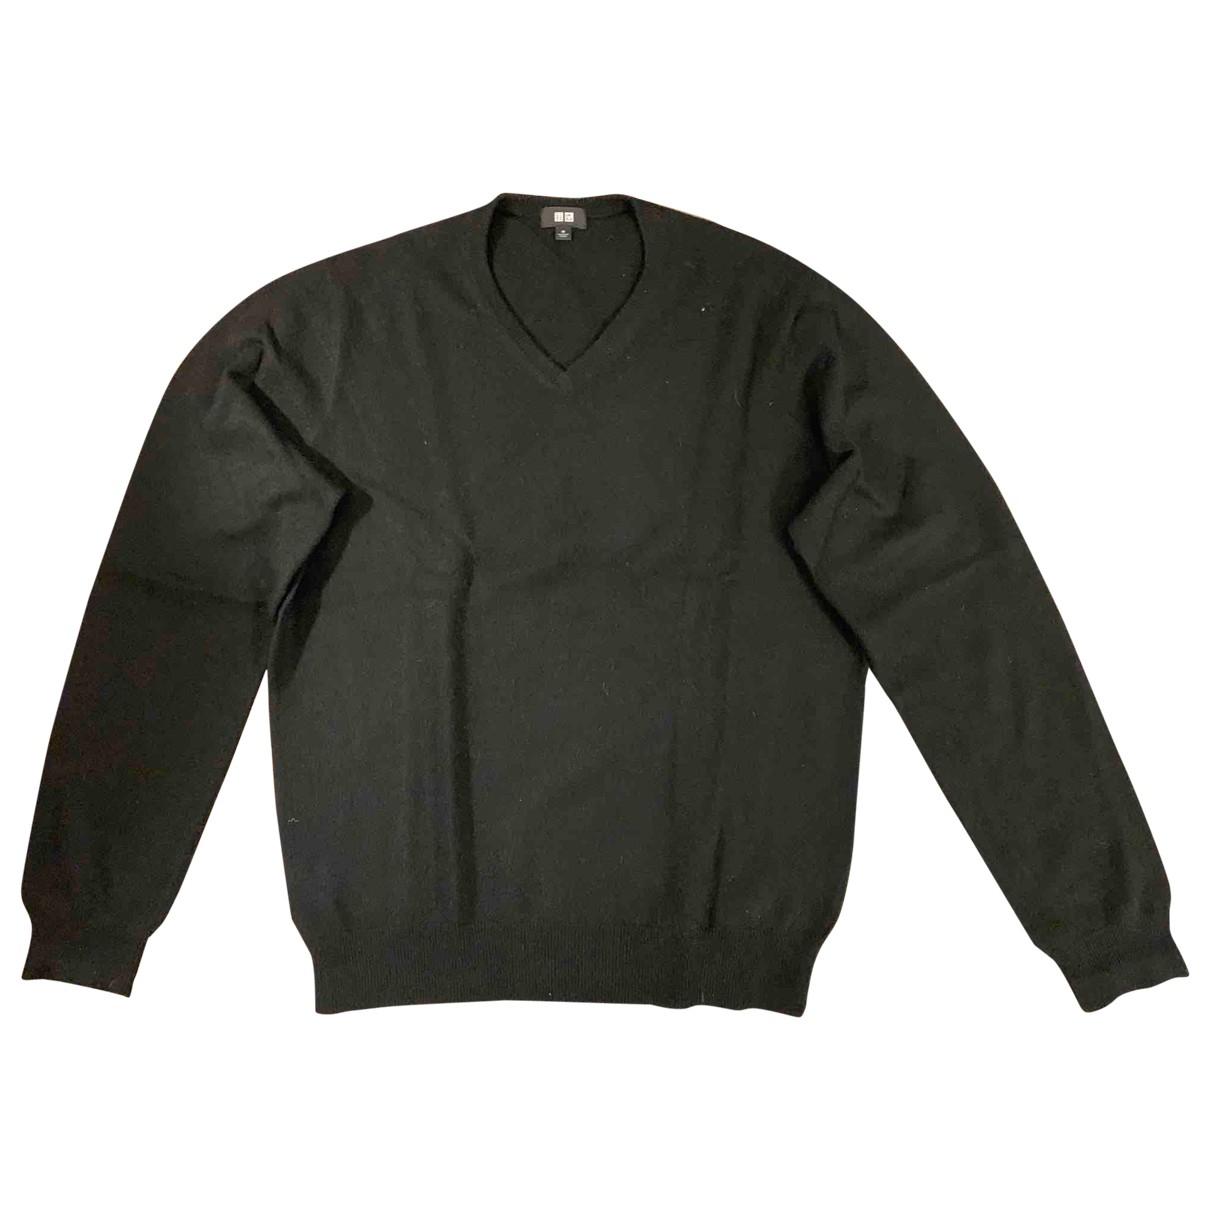 Uniqlo \N Black Cashmere Knitwear & Sweatshirts for Men M International